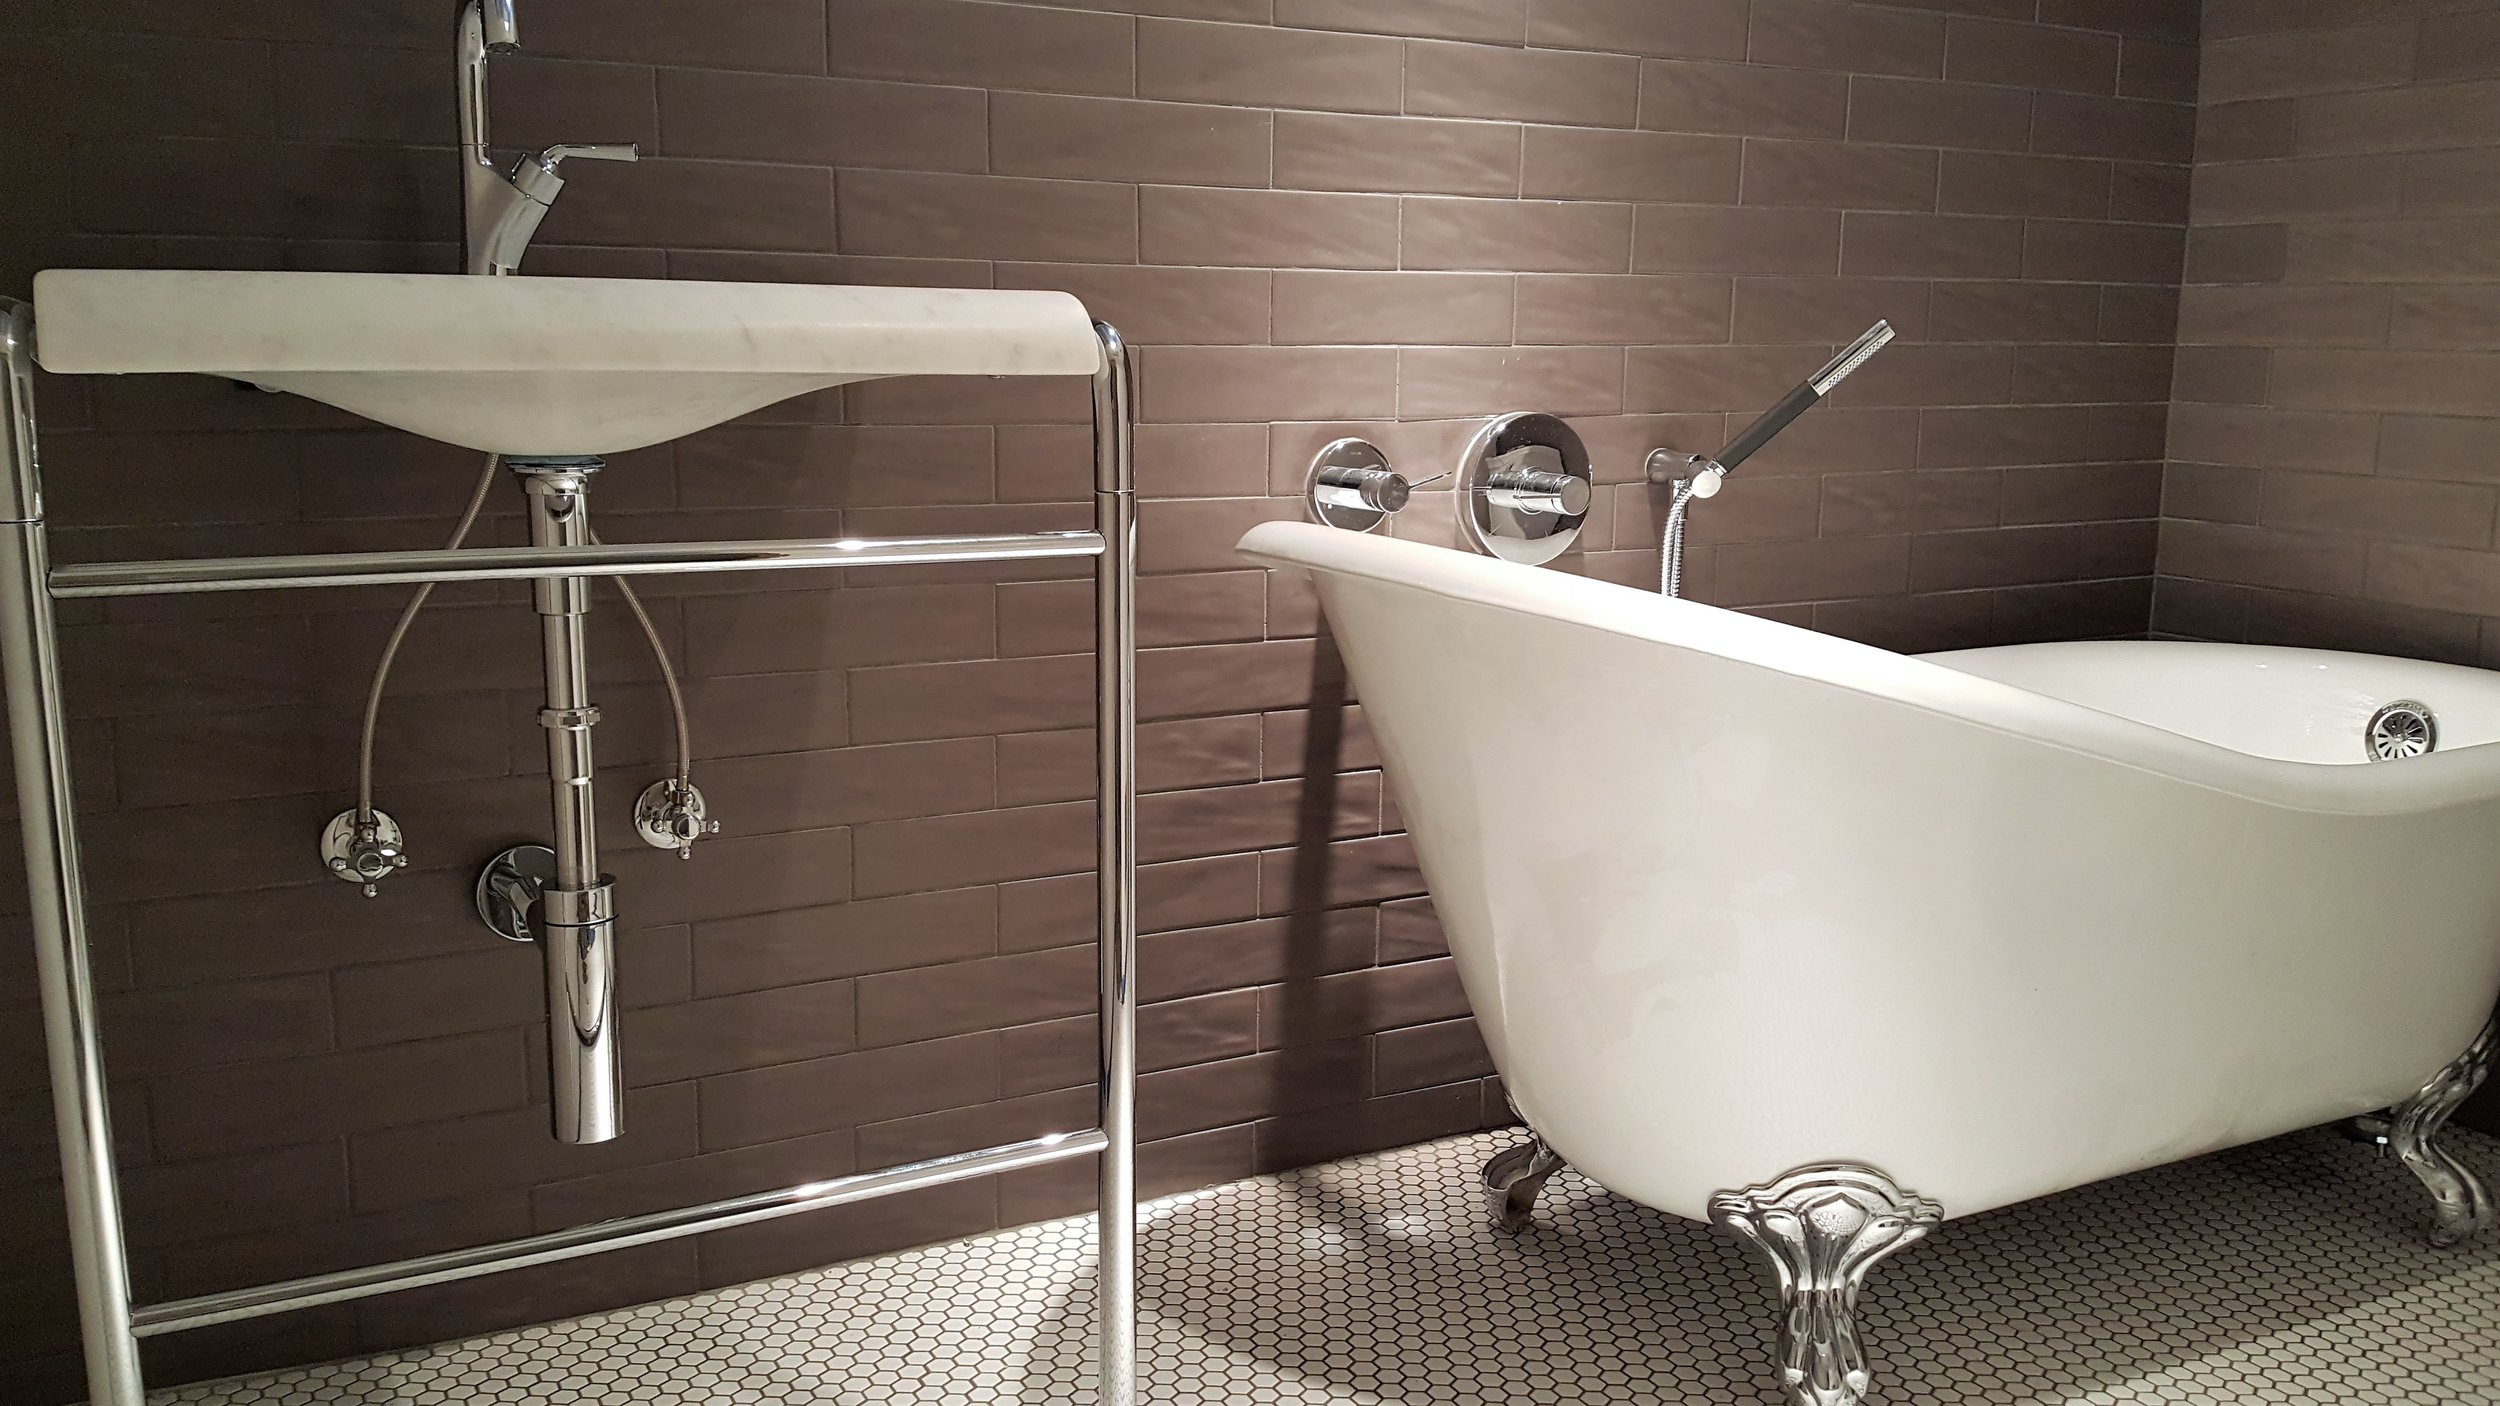 sink and tub 2.jpg